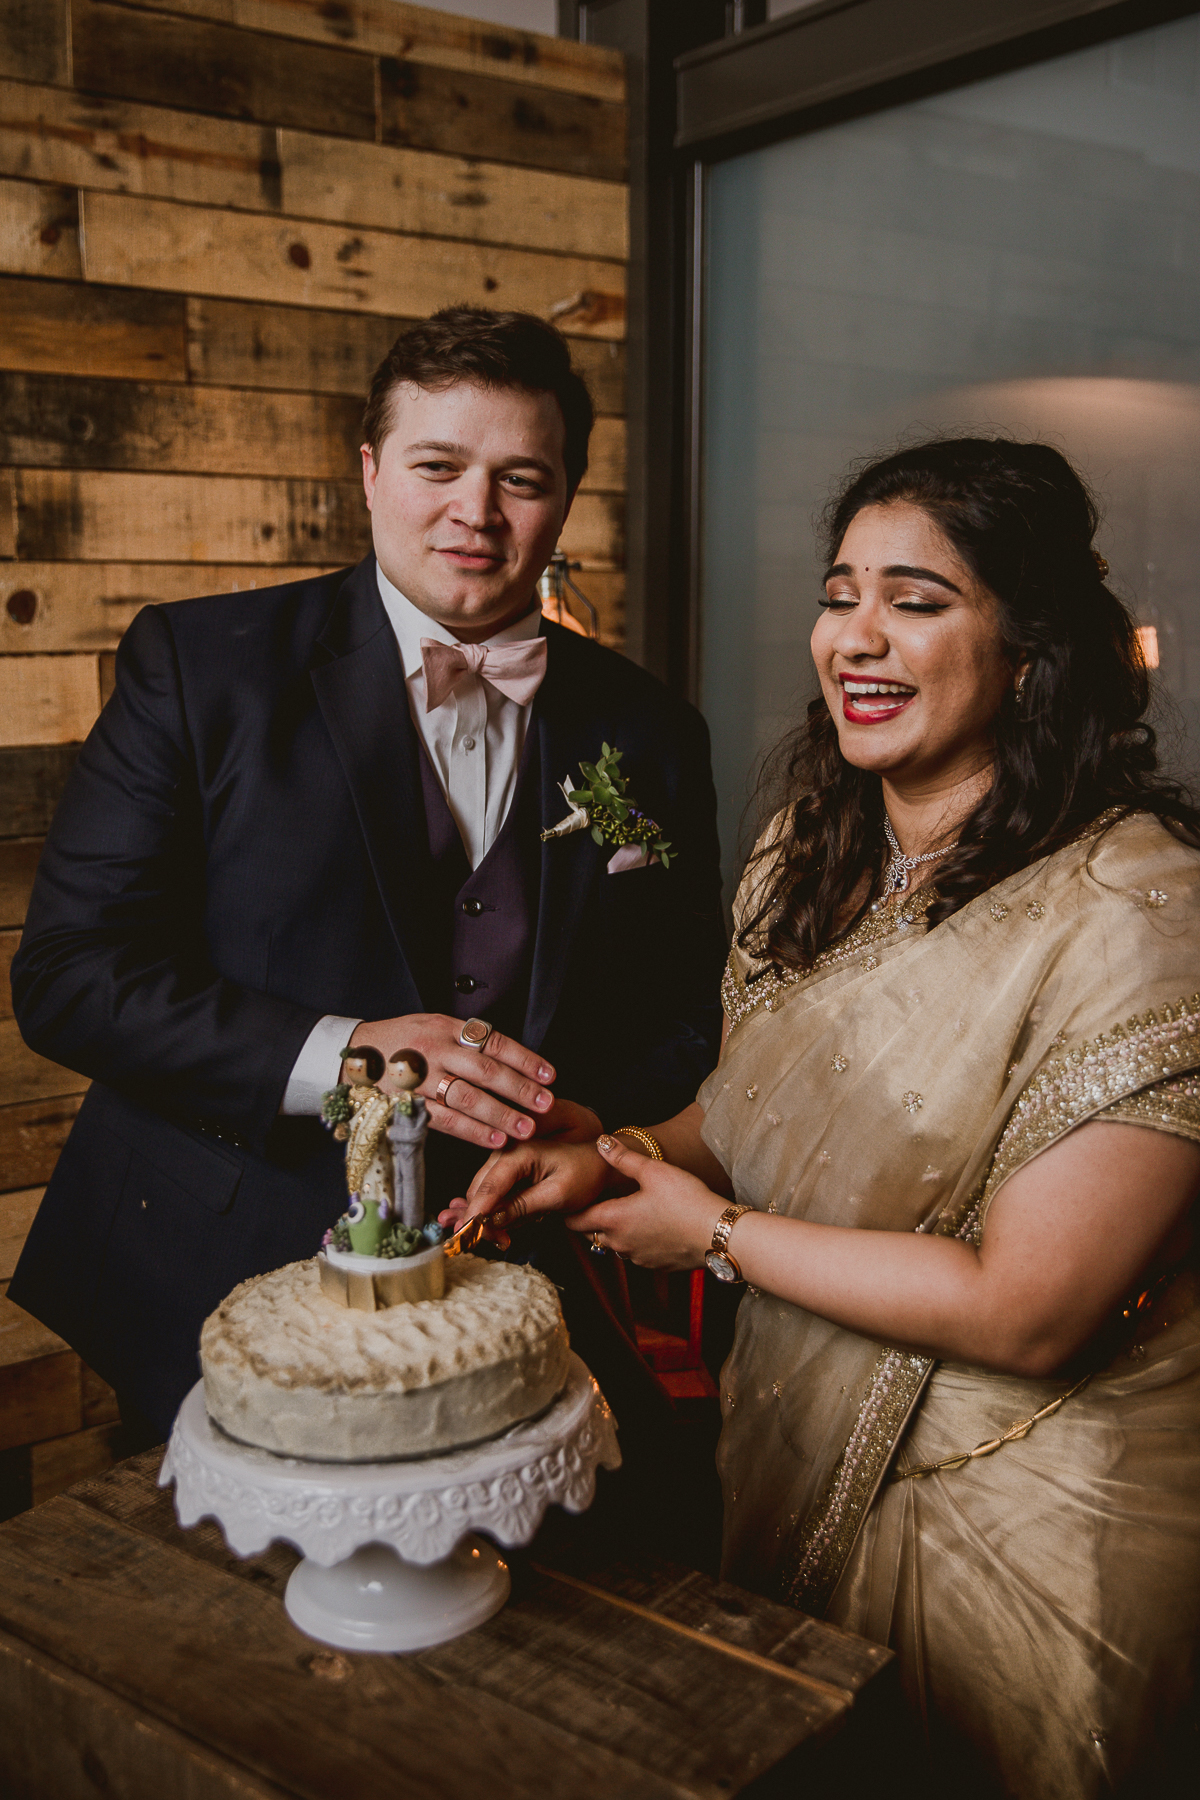 eventide-brewery-indian-american-fusion-kelley-raye-atlanta-los-angeles-wedding-photographer-112.jpg